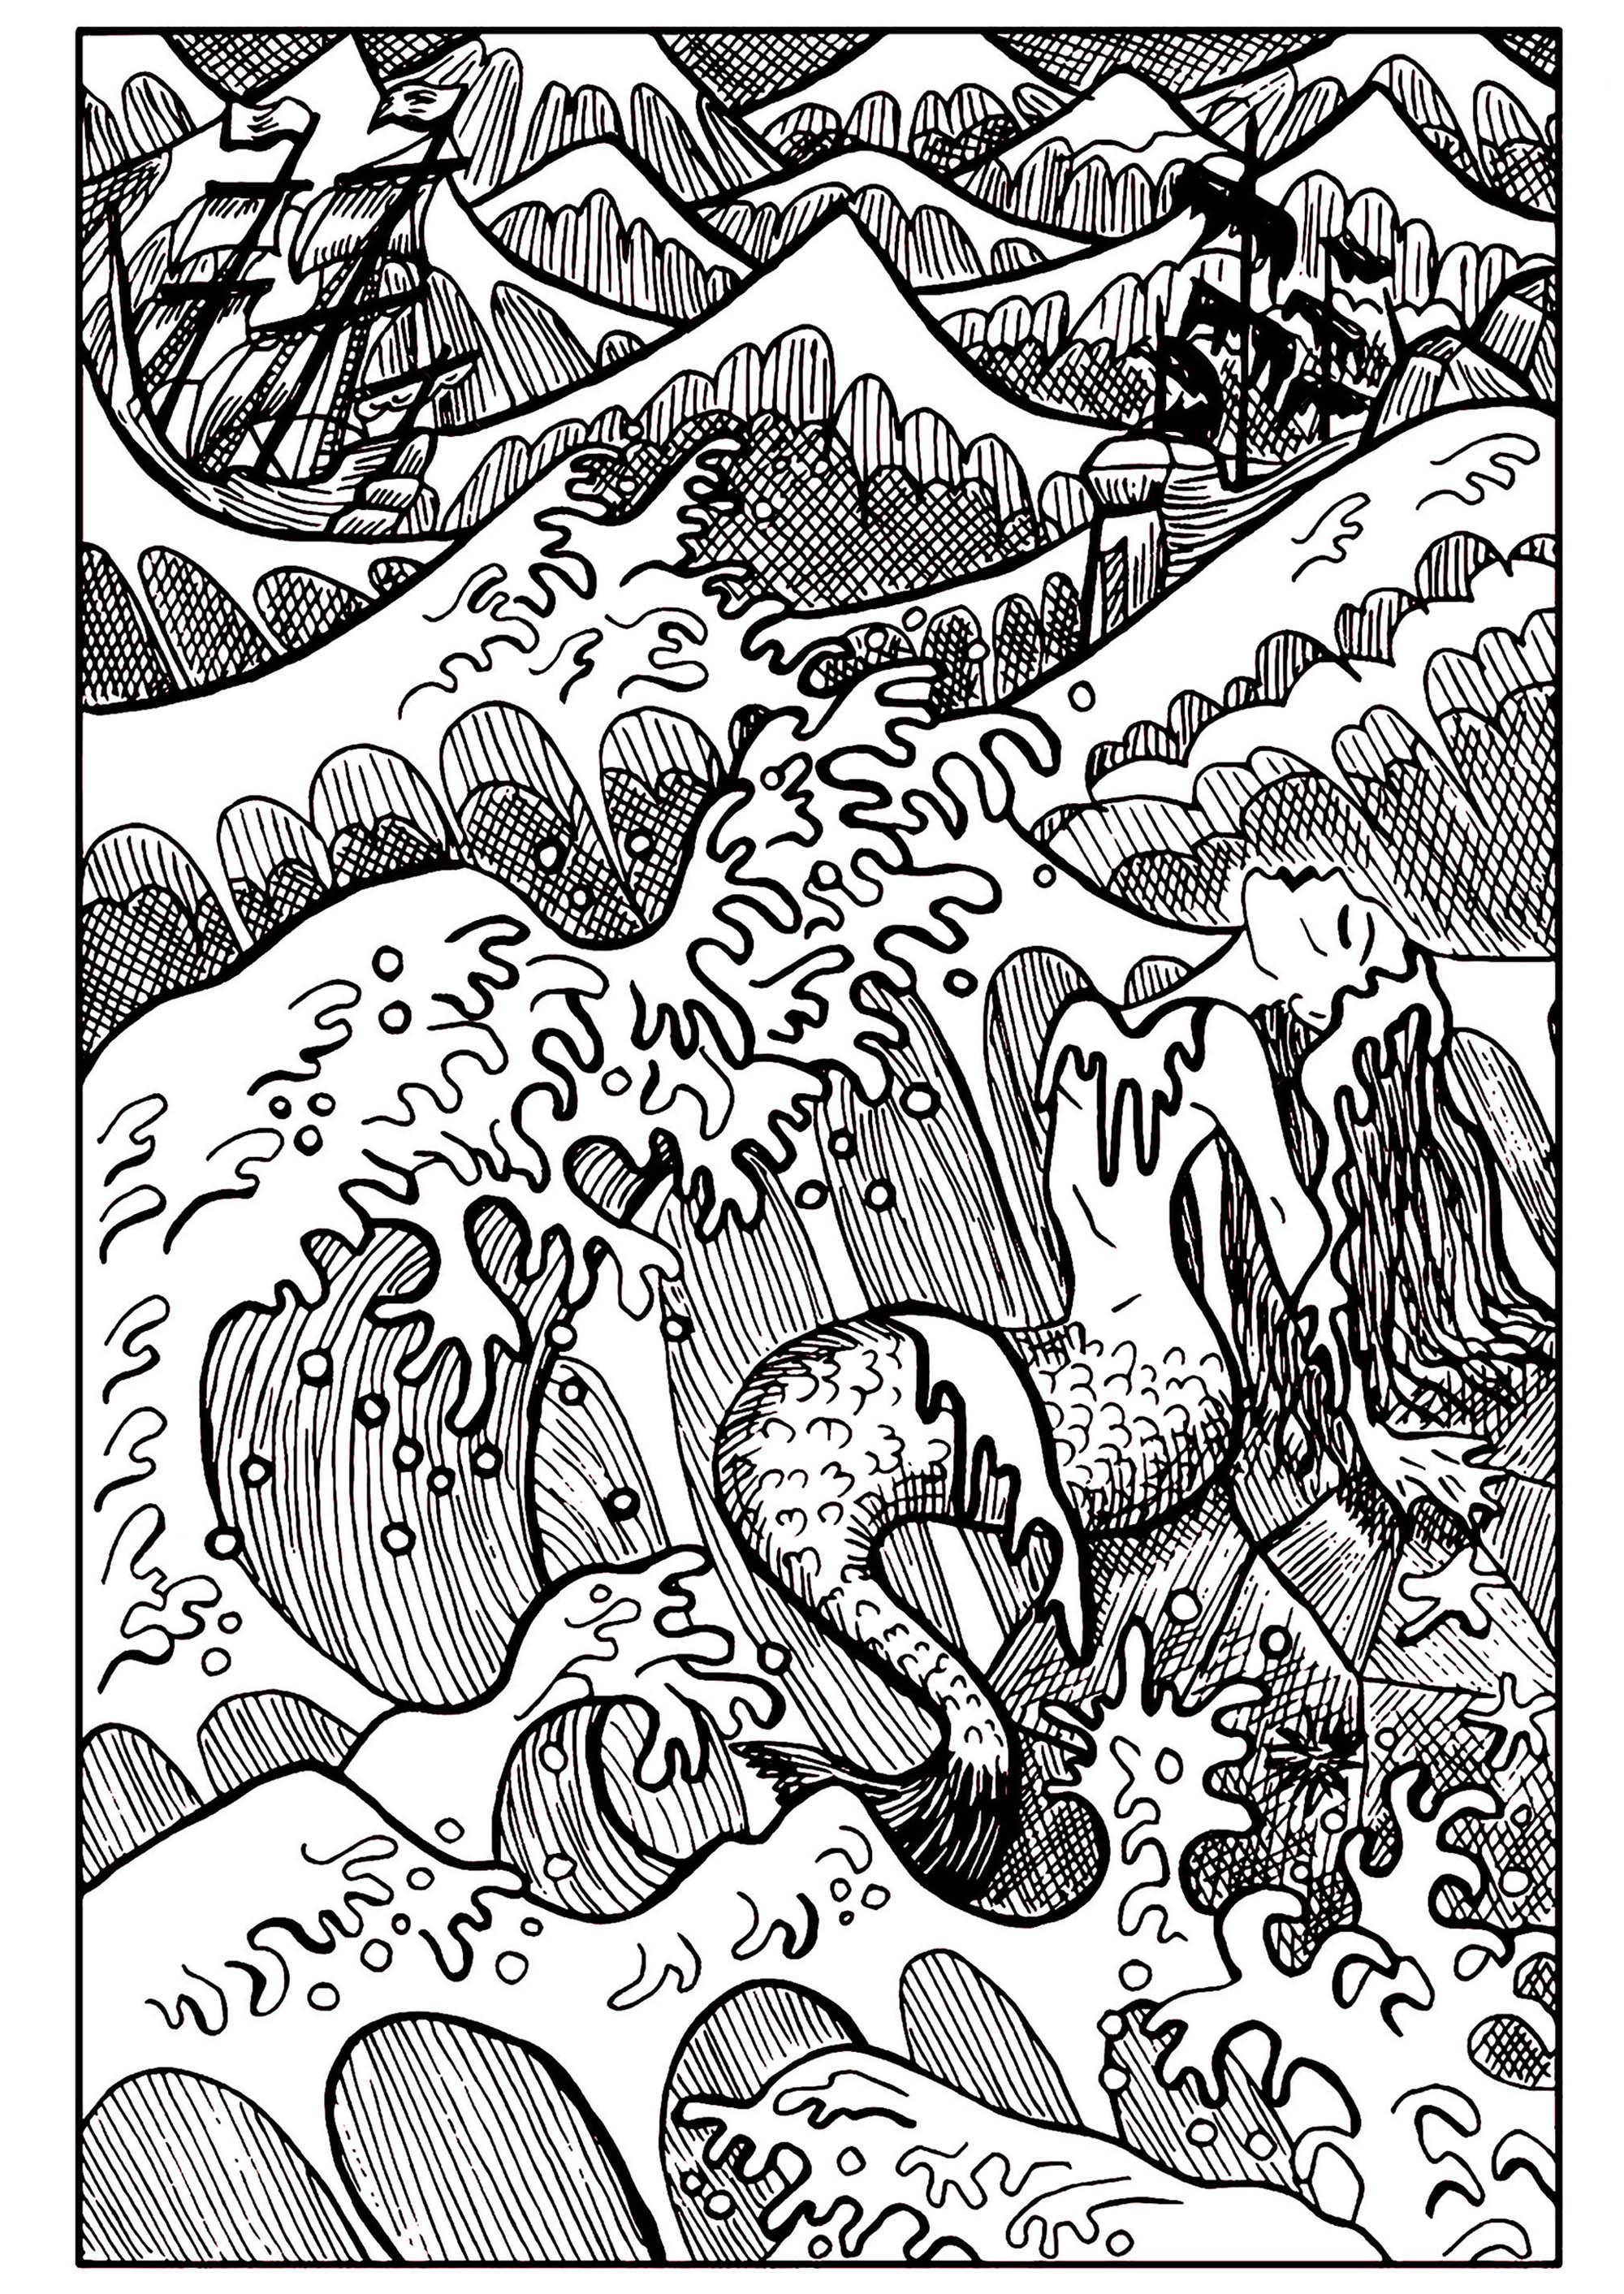 Mermaid In The Sea Mermaids Adult Coloring Pages